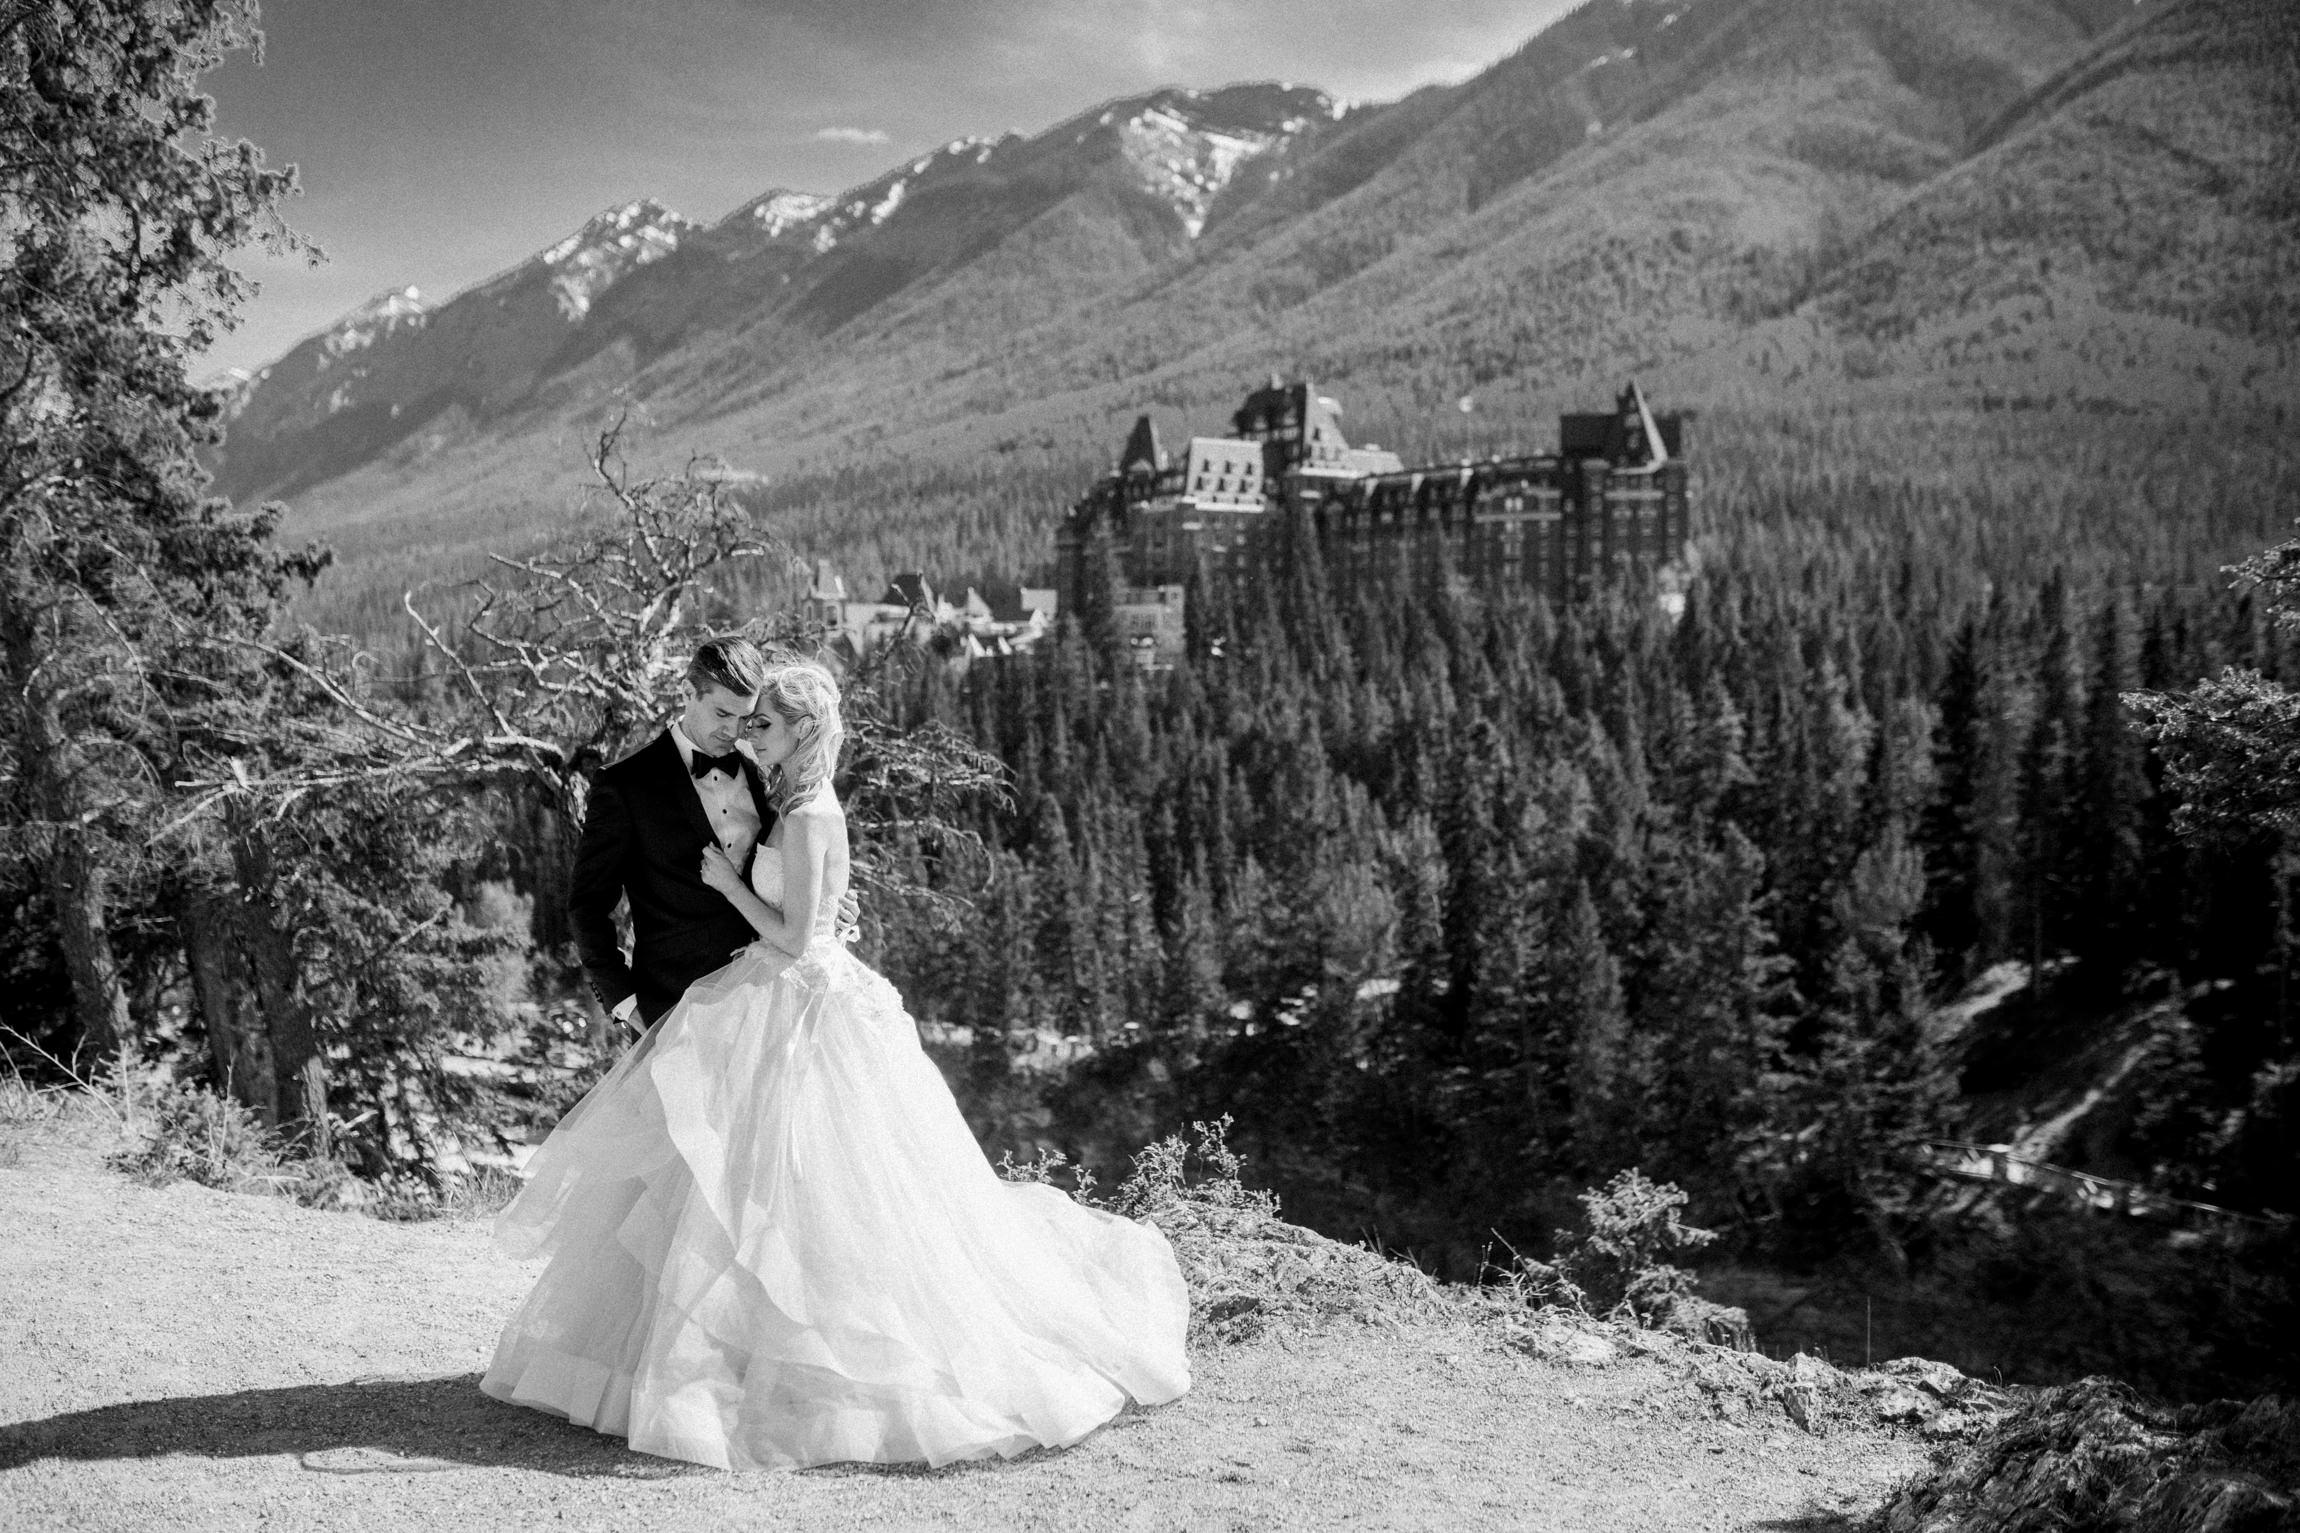 Banff-Springs-Surprise-corner-wedding-1.jpg